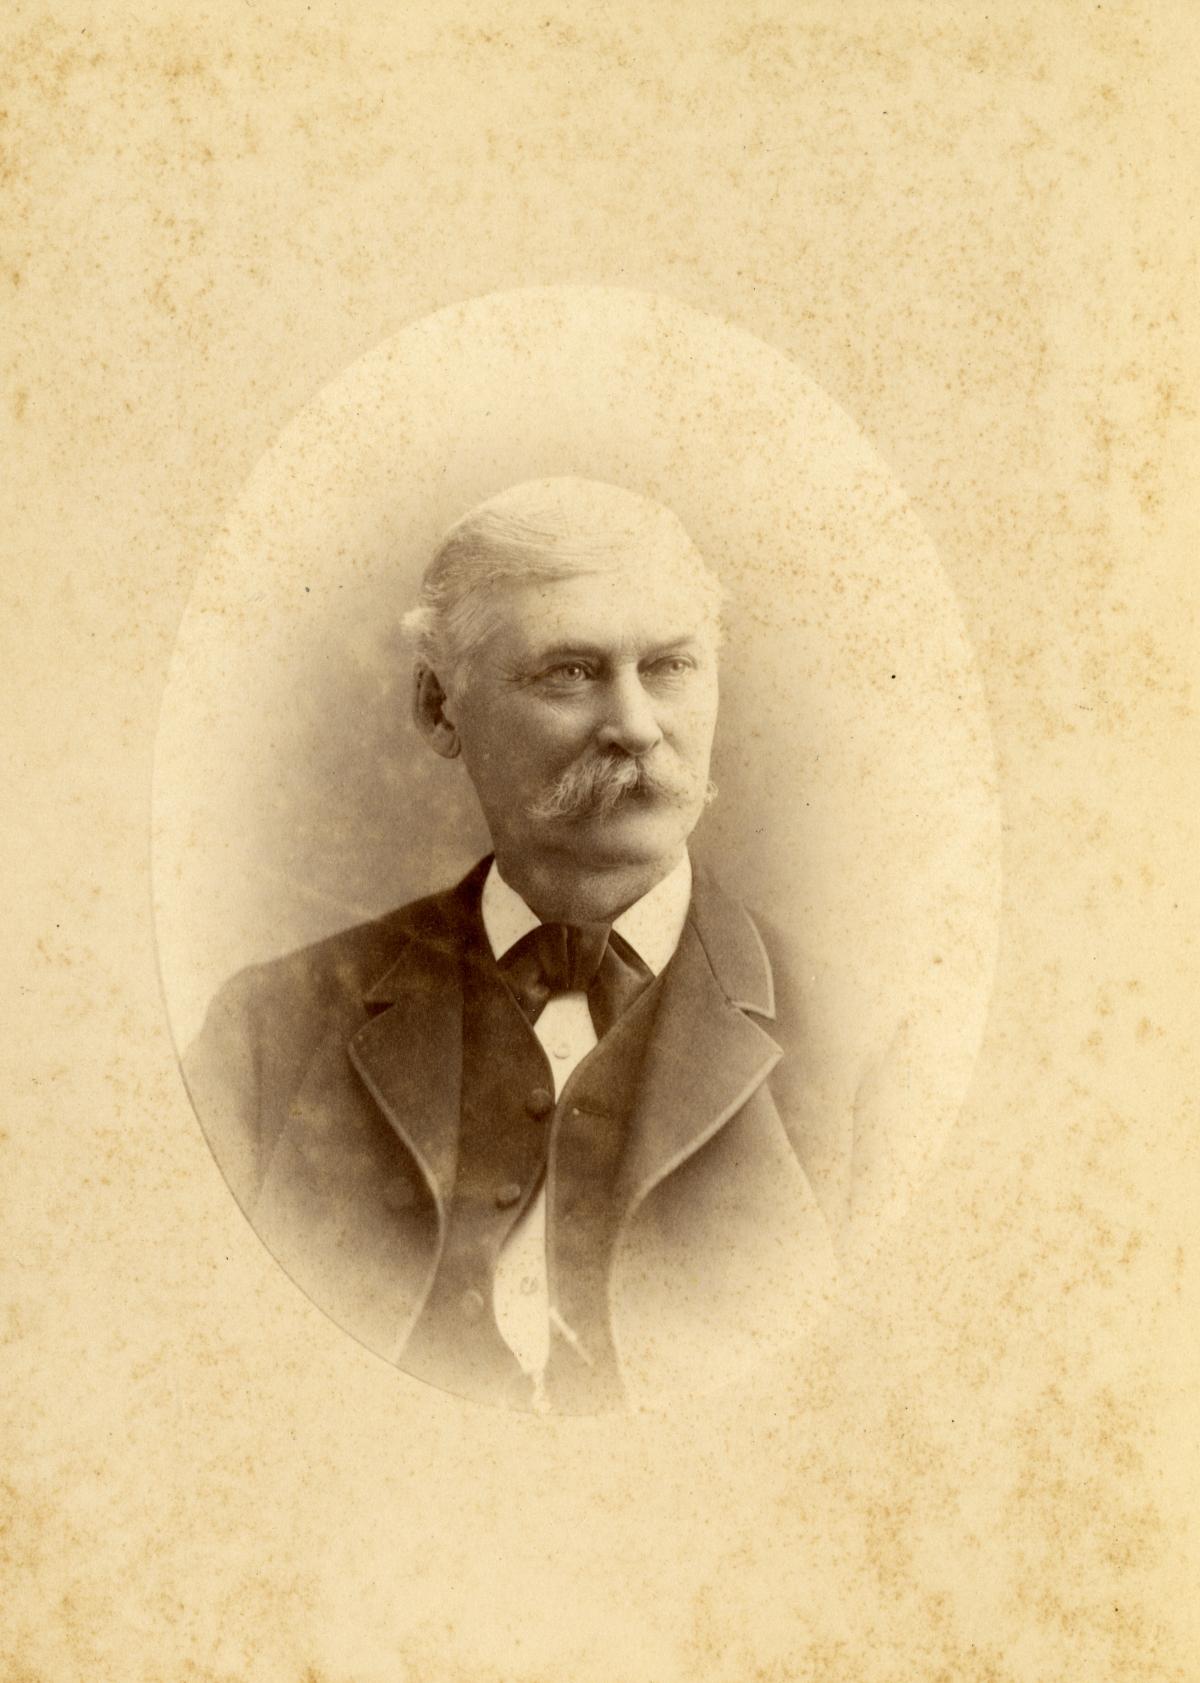 Portrait of John Cook.